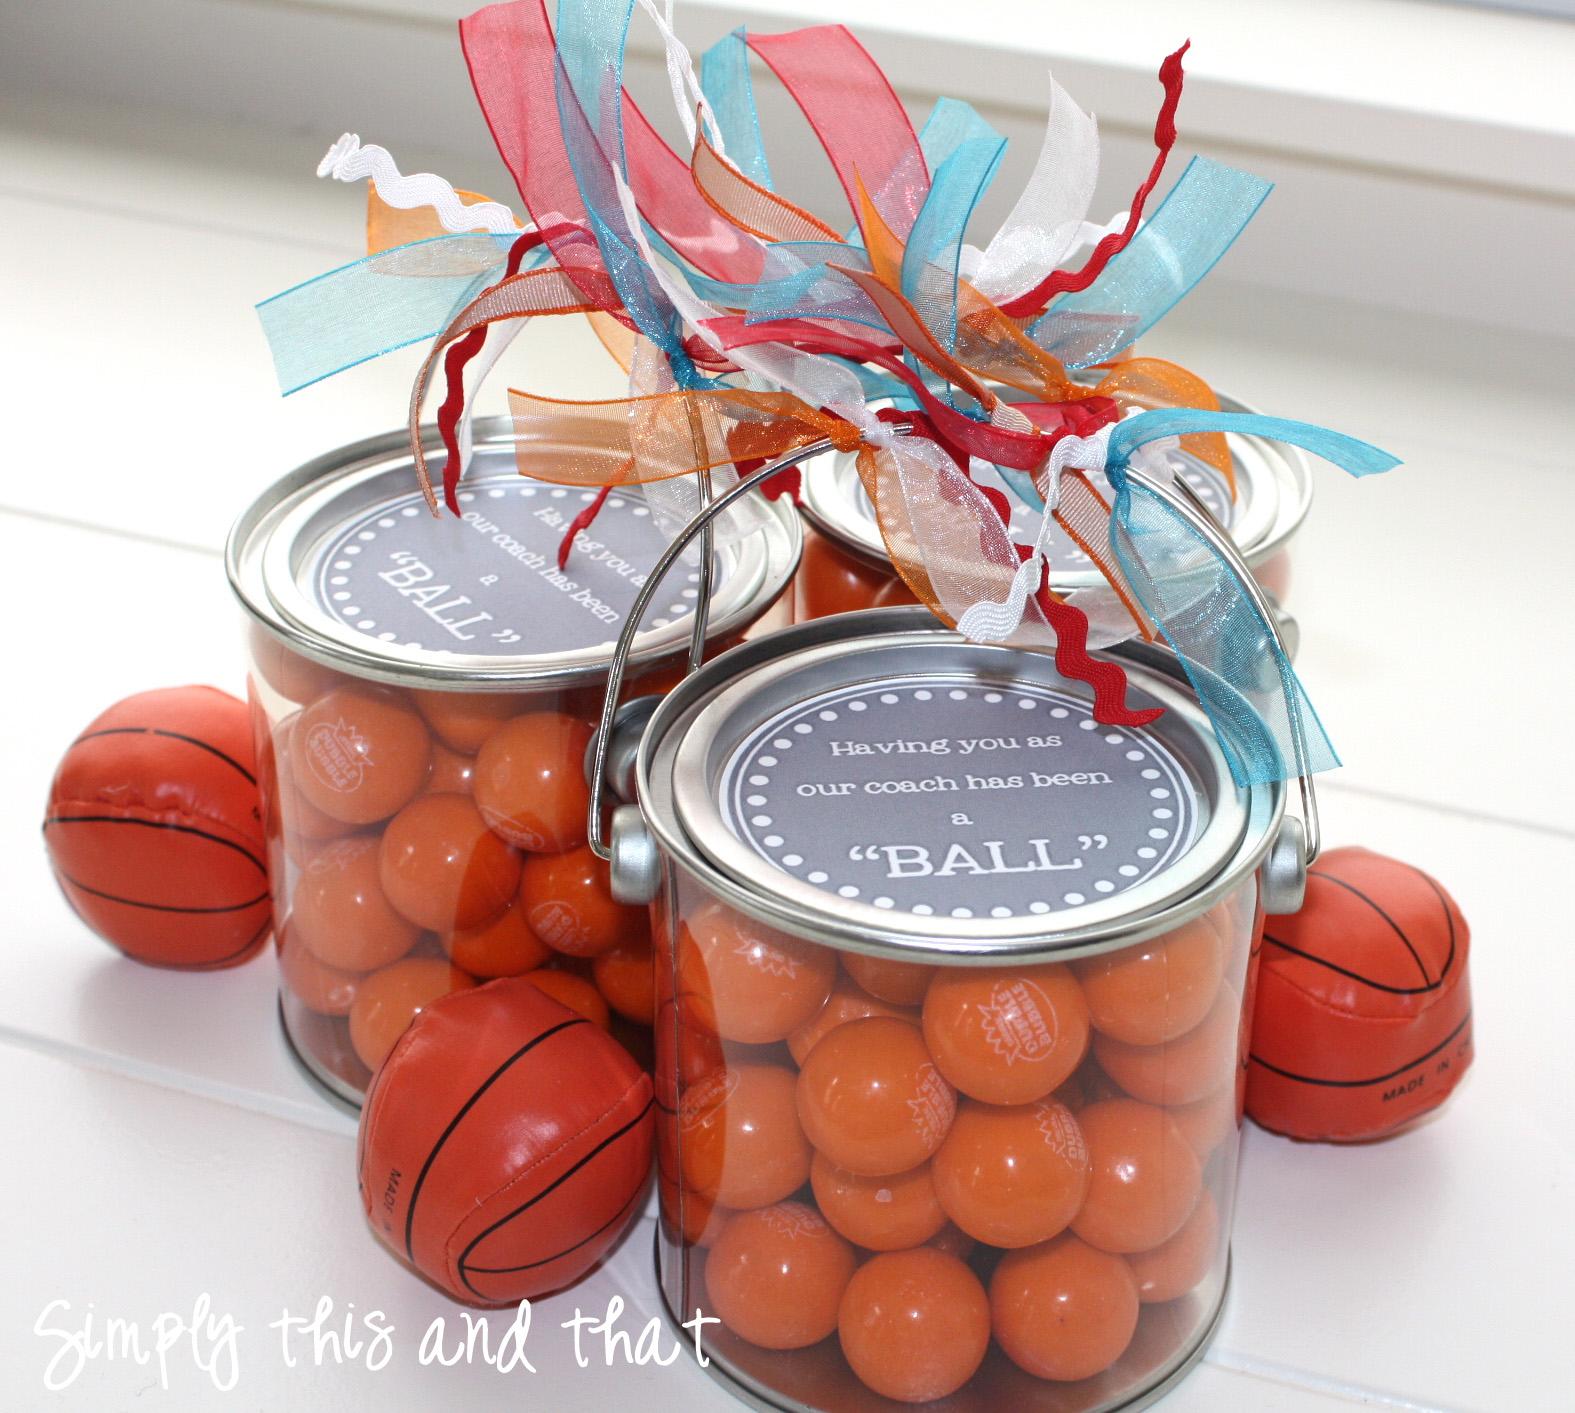 basketball coach gift ideas